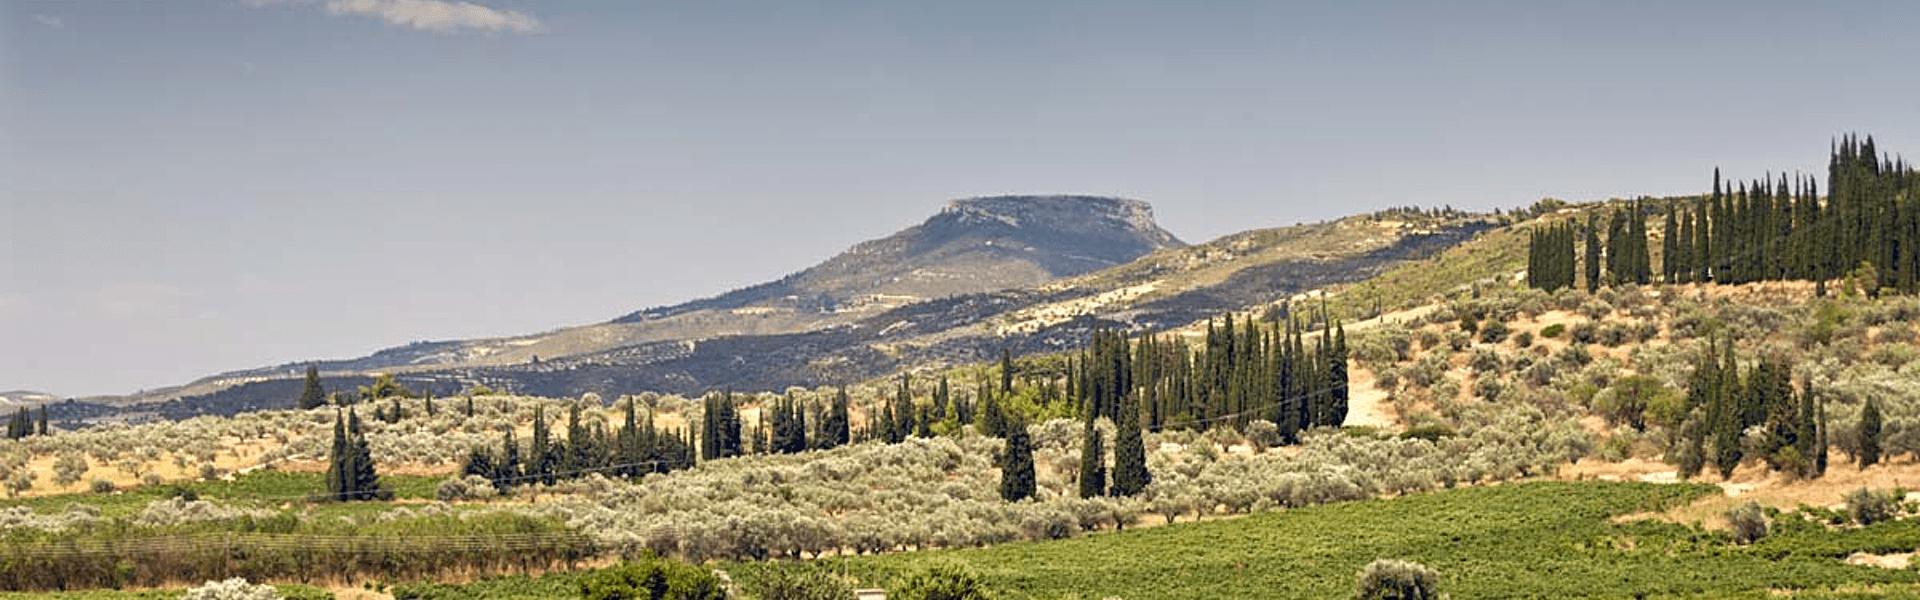 Griekenland | Wandelen over de Menalon Trail